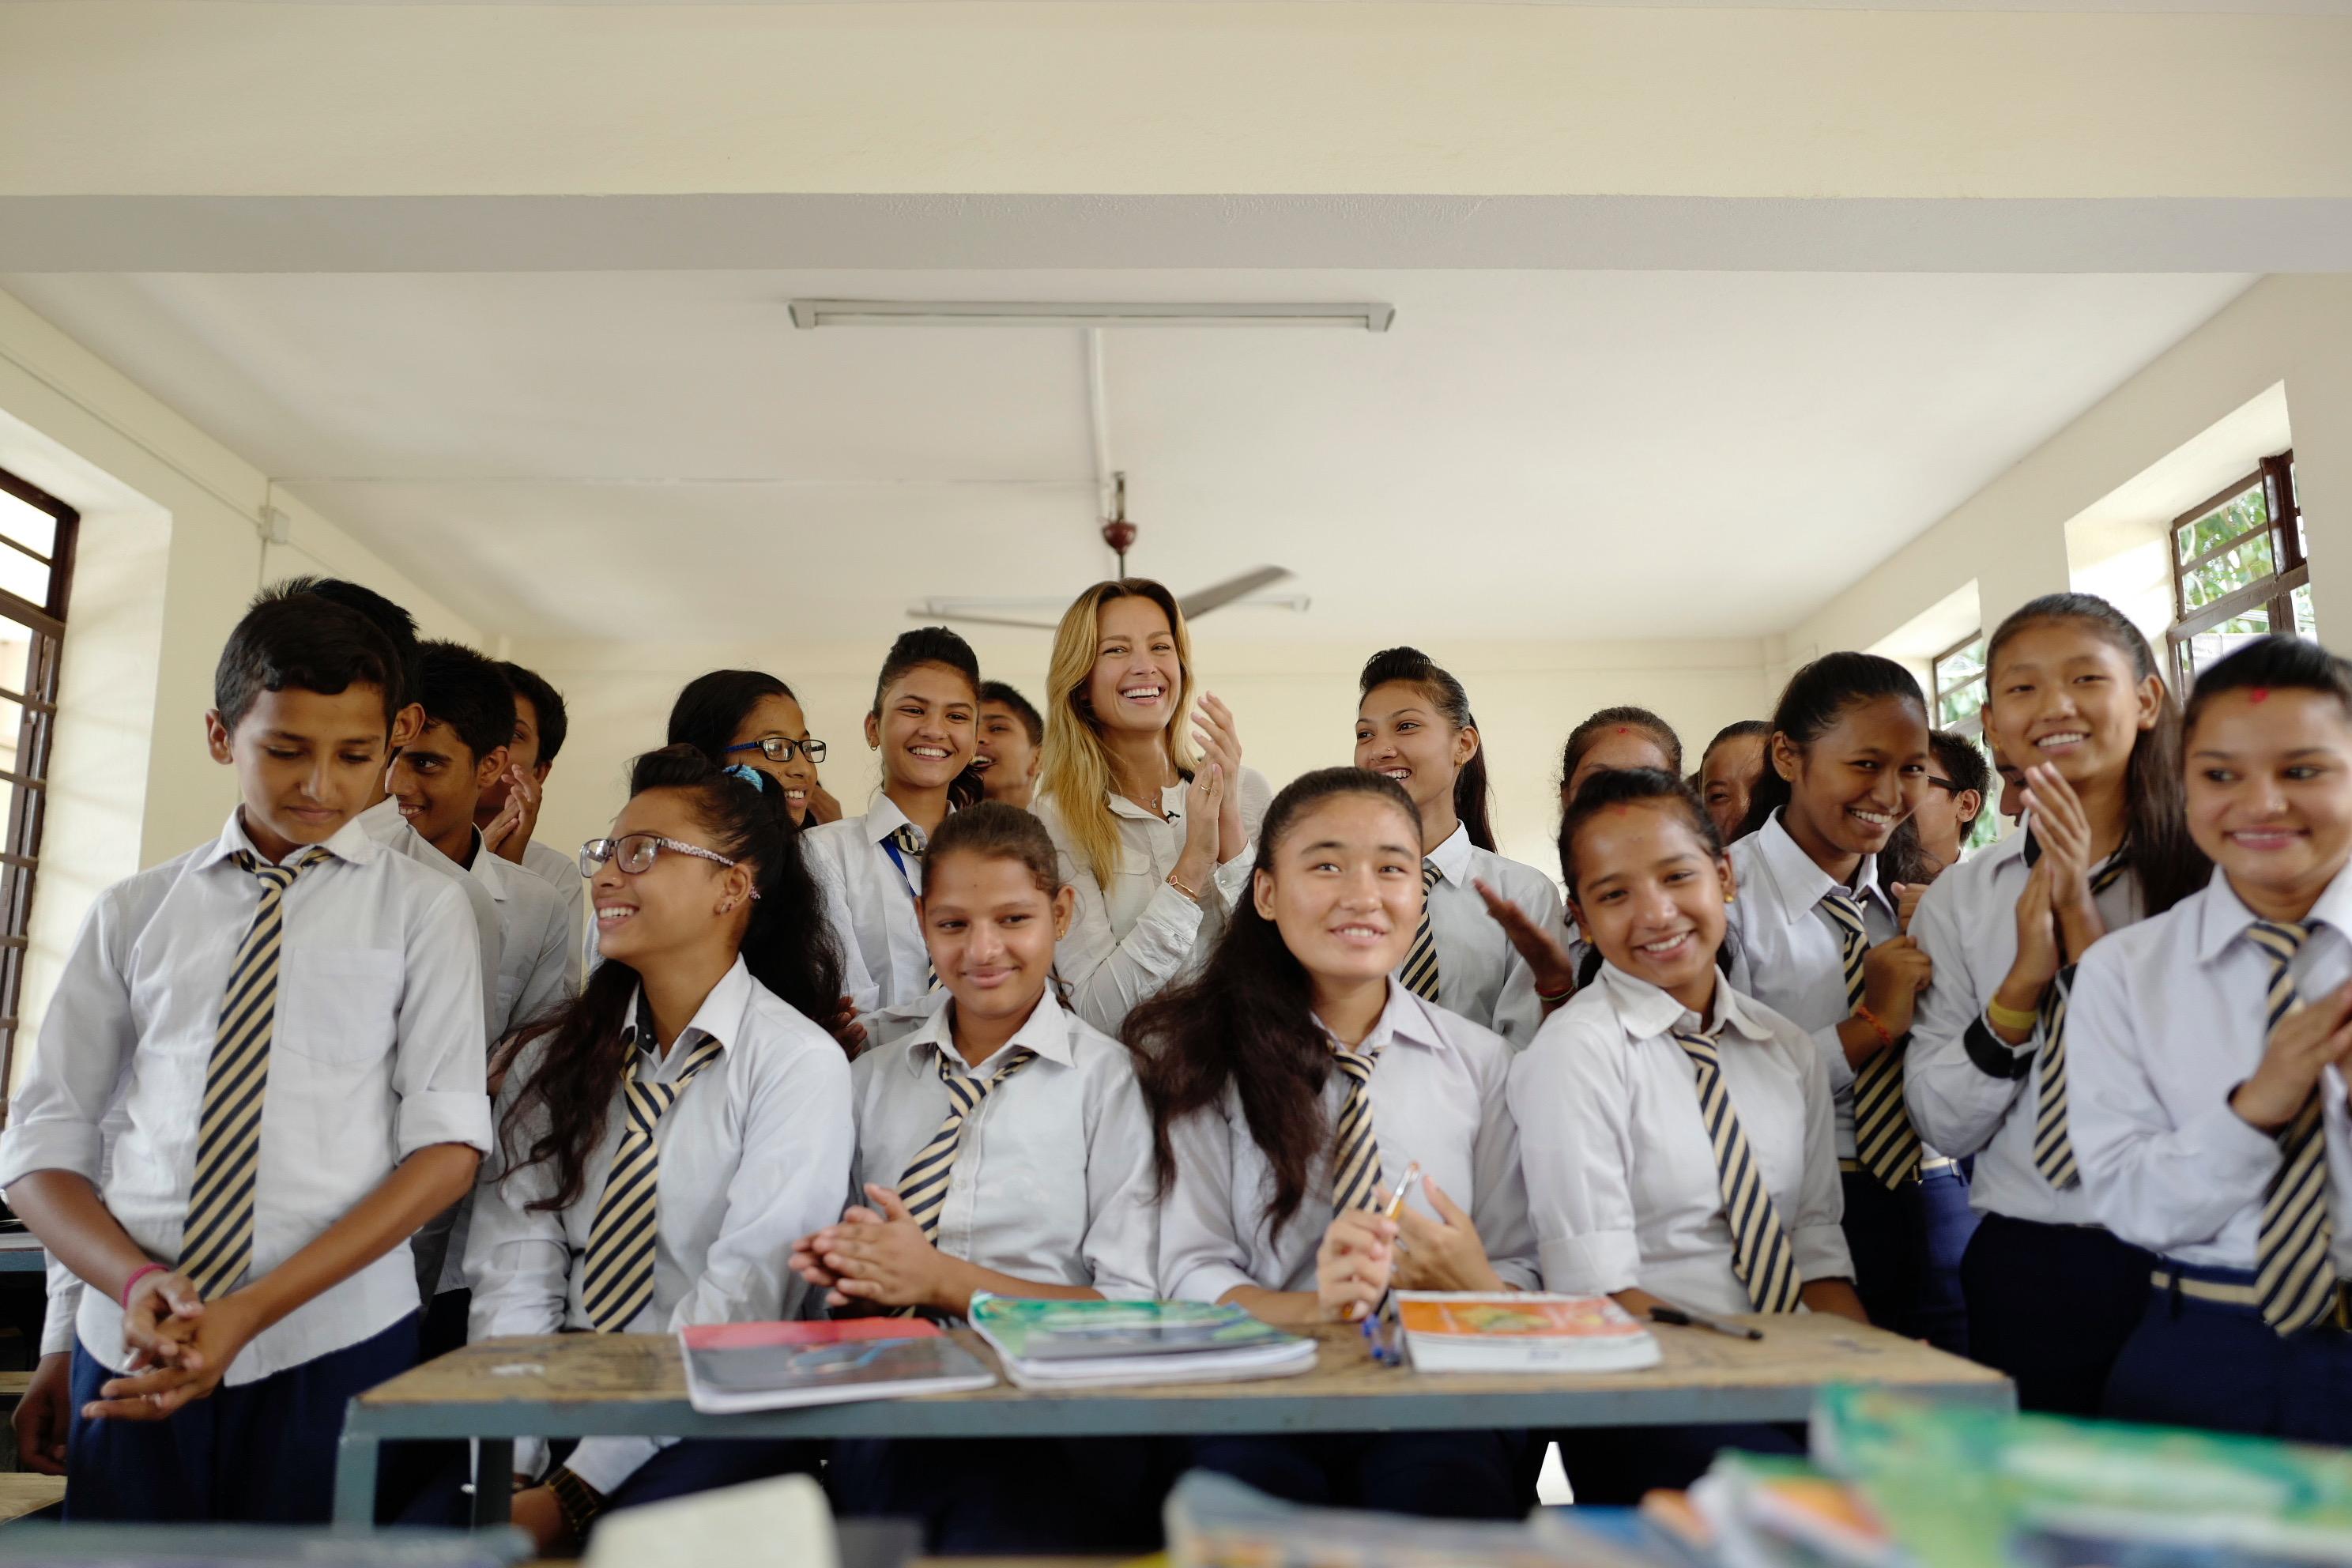 Tumi's 2016 sale event helped Petra Nemcova's Happy Hearts rebuild two schools in Nepal.